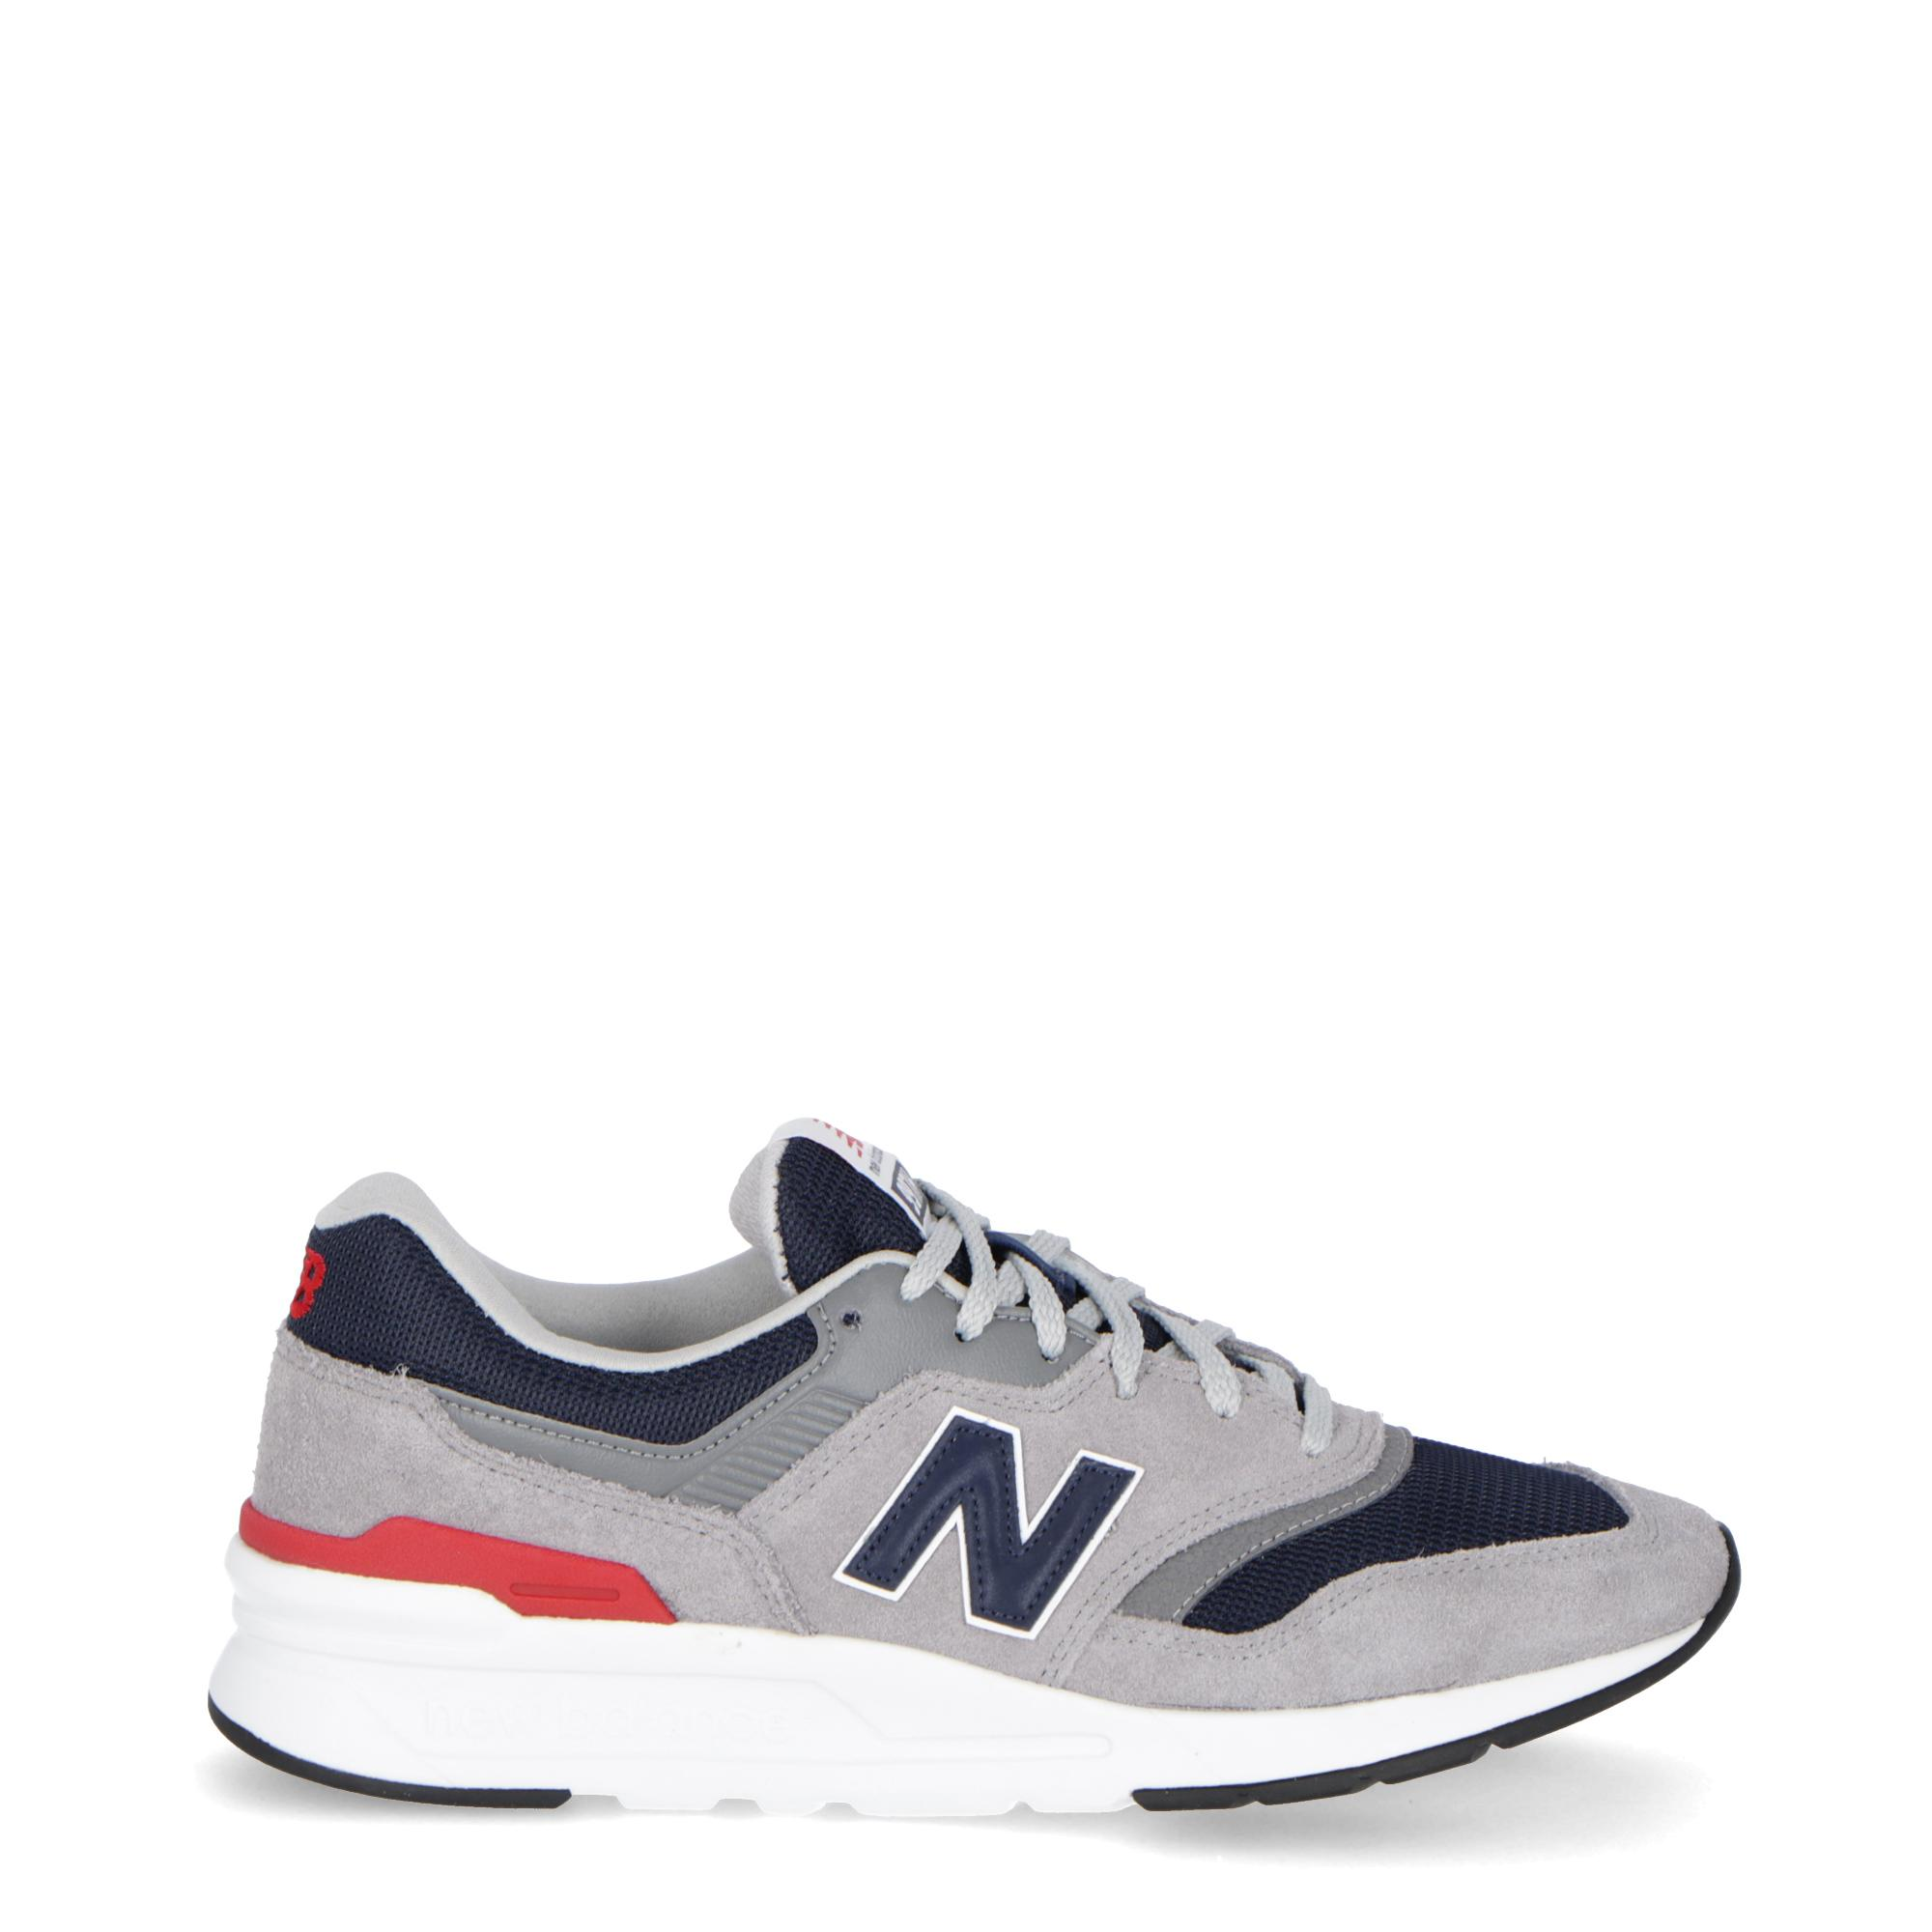 4d5093fb98ad6 New Balance 997 Grey/navy/red | Treesse